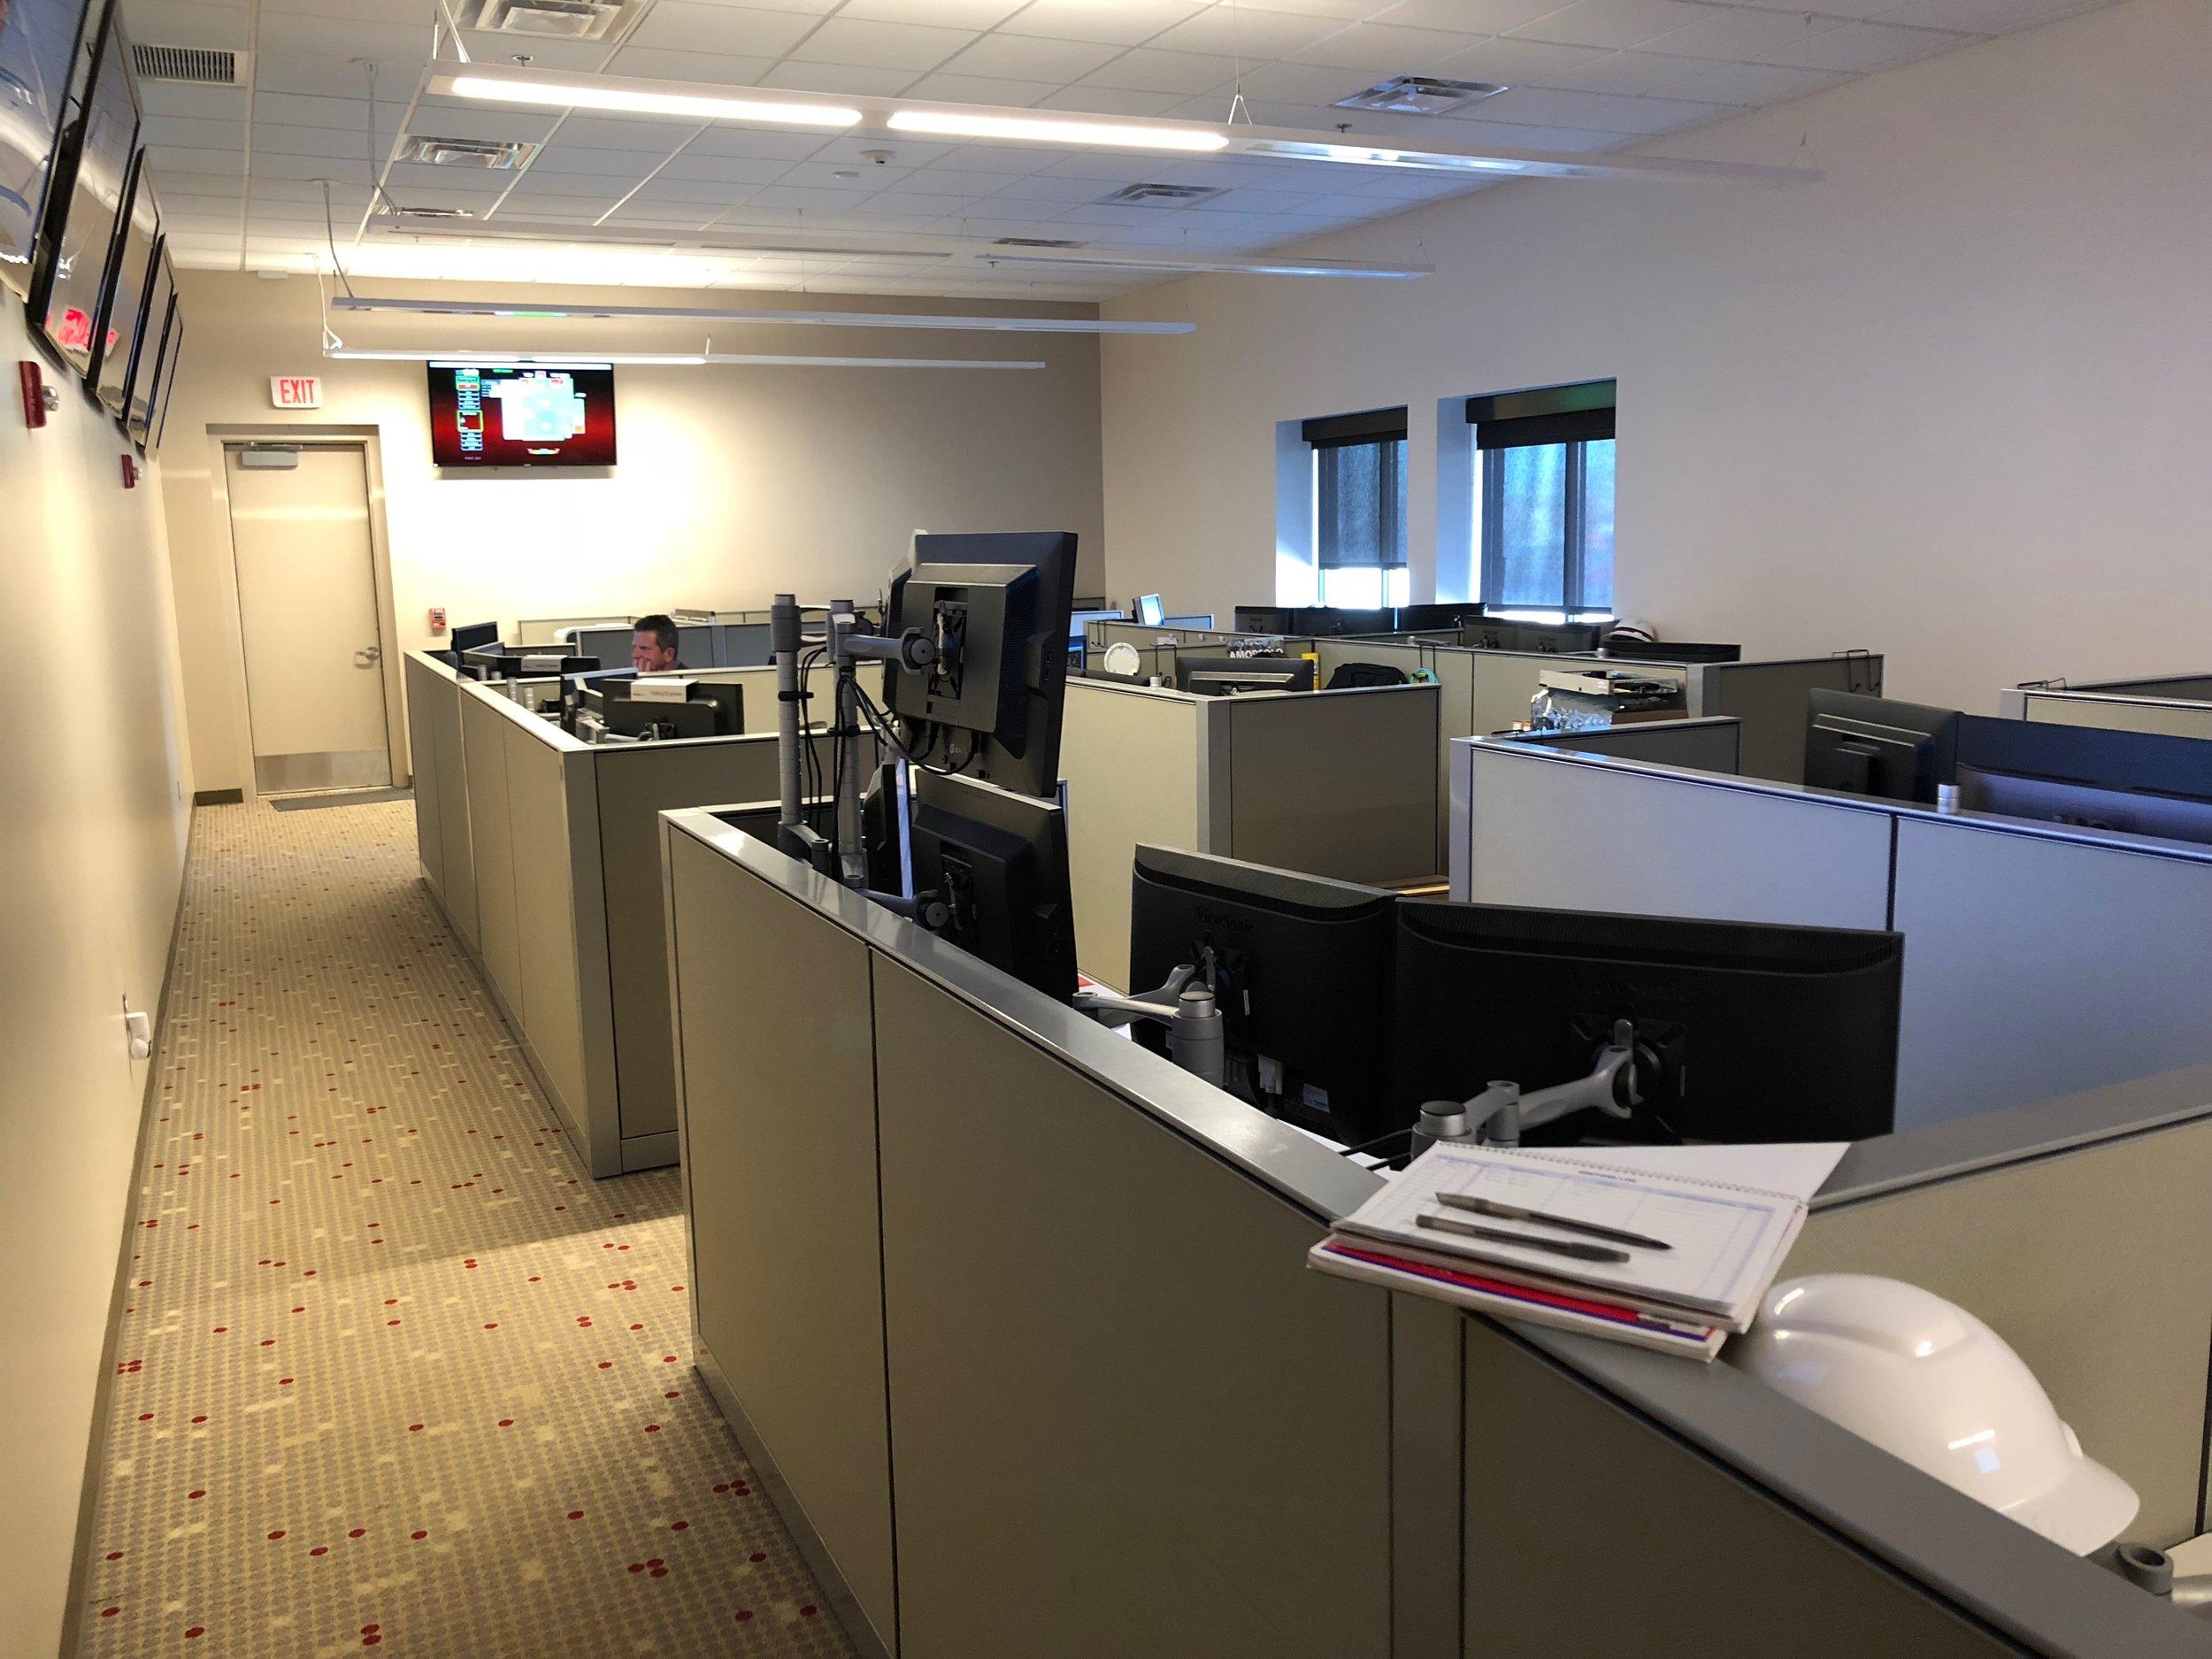 Aurora, CO - building expansion, office & restroom remodel